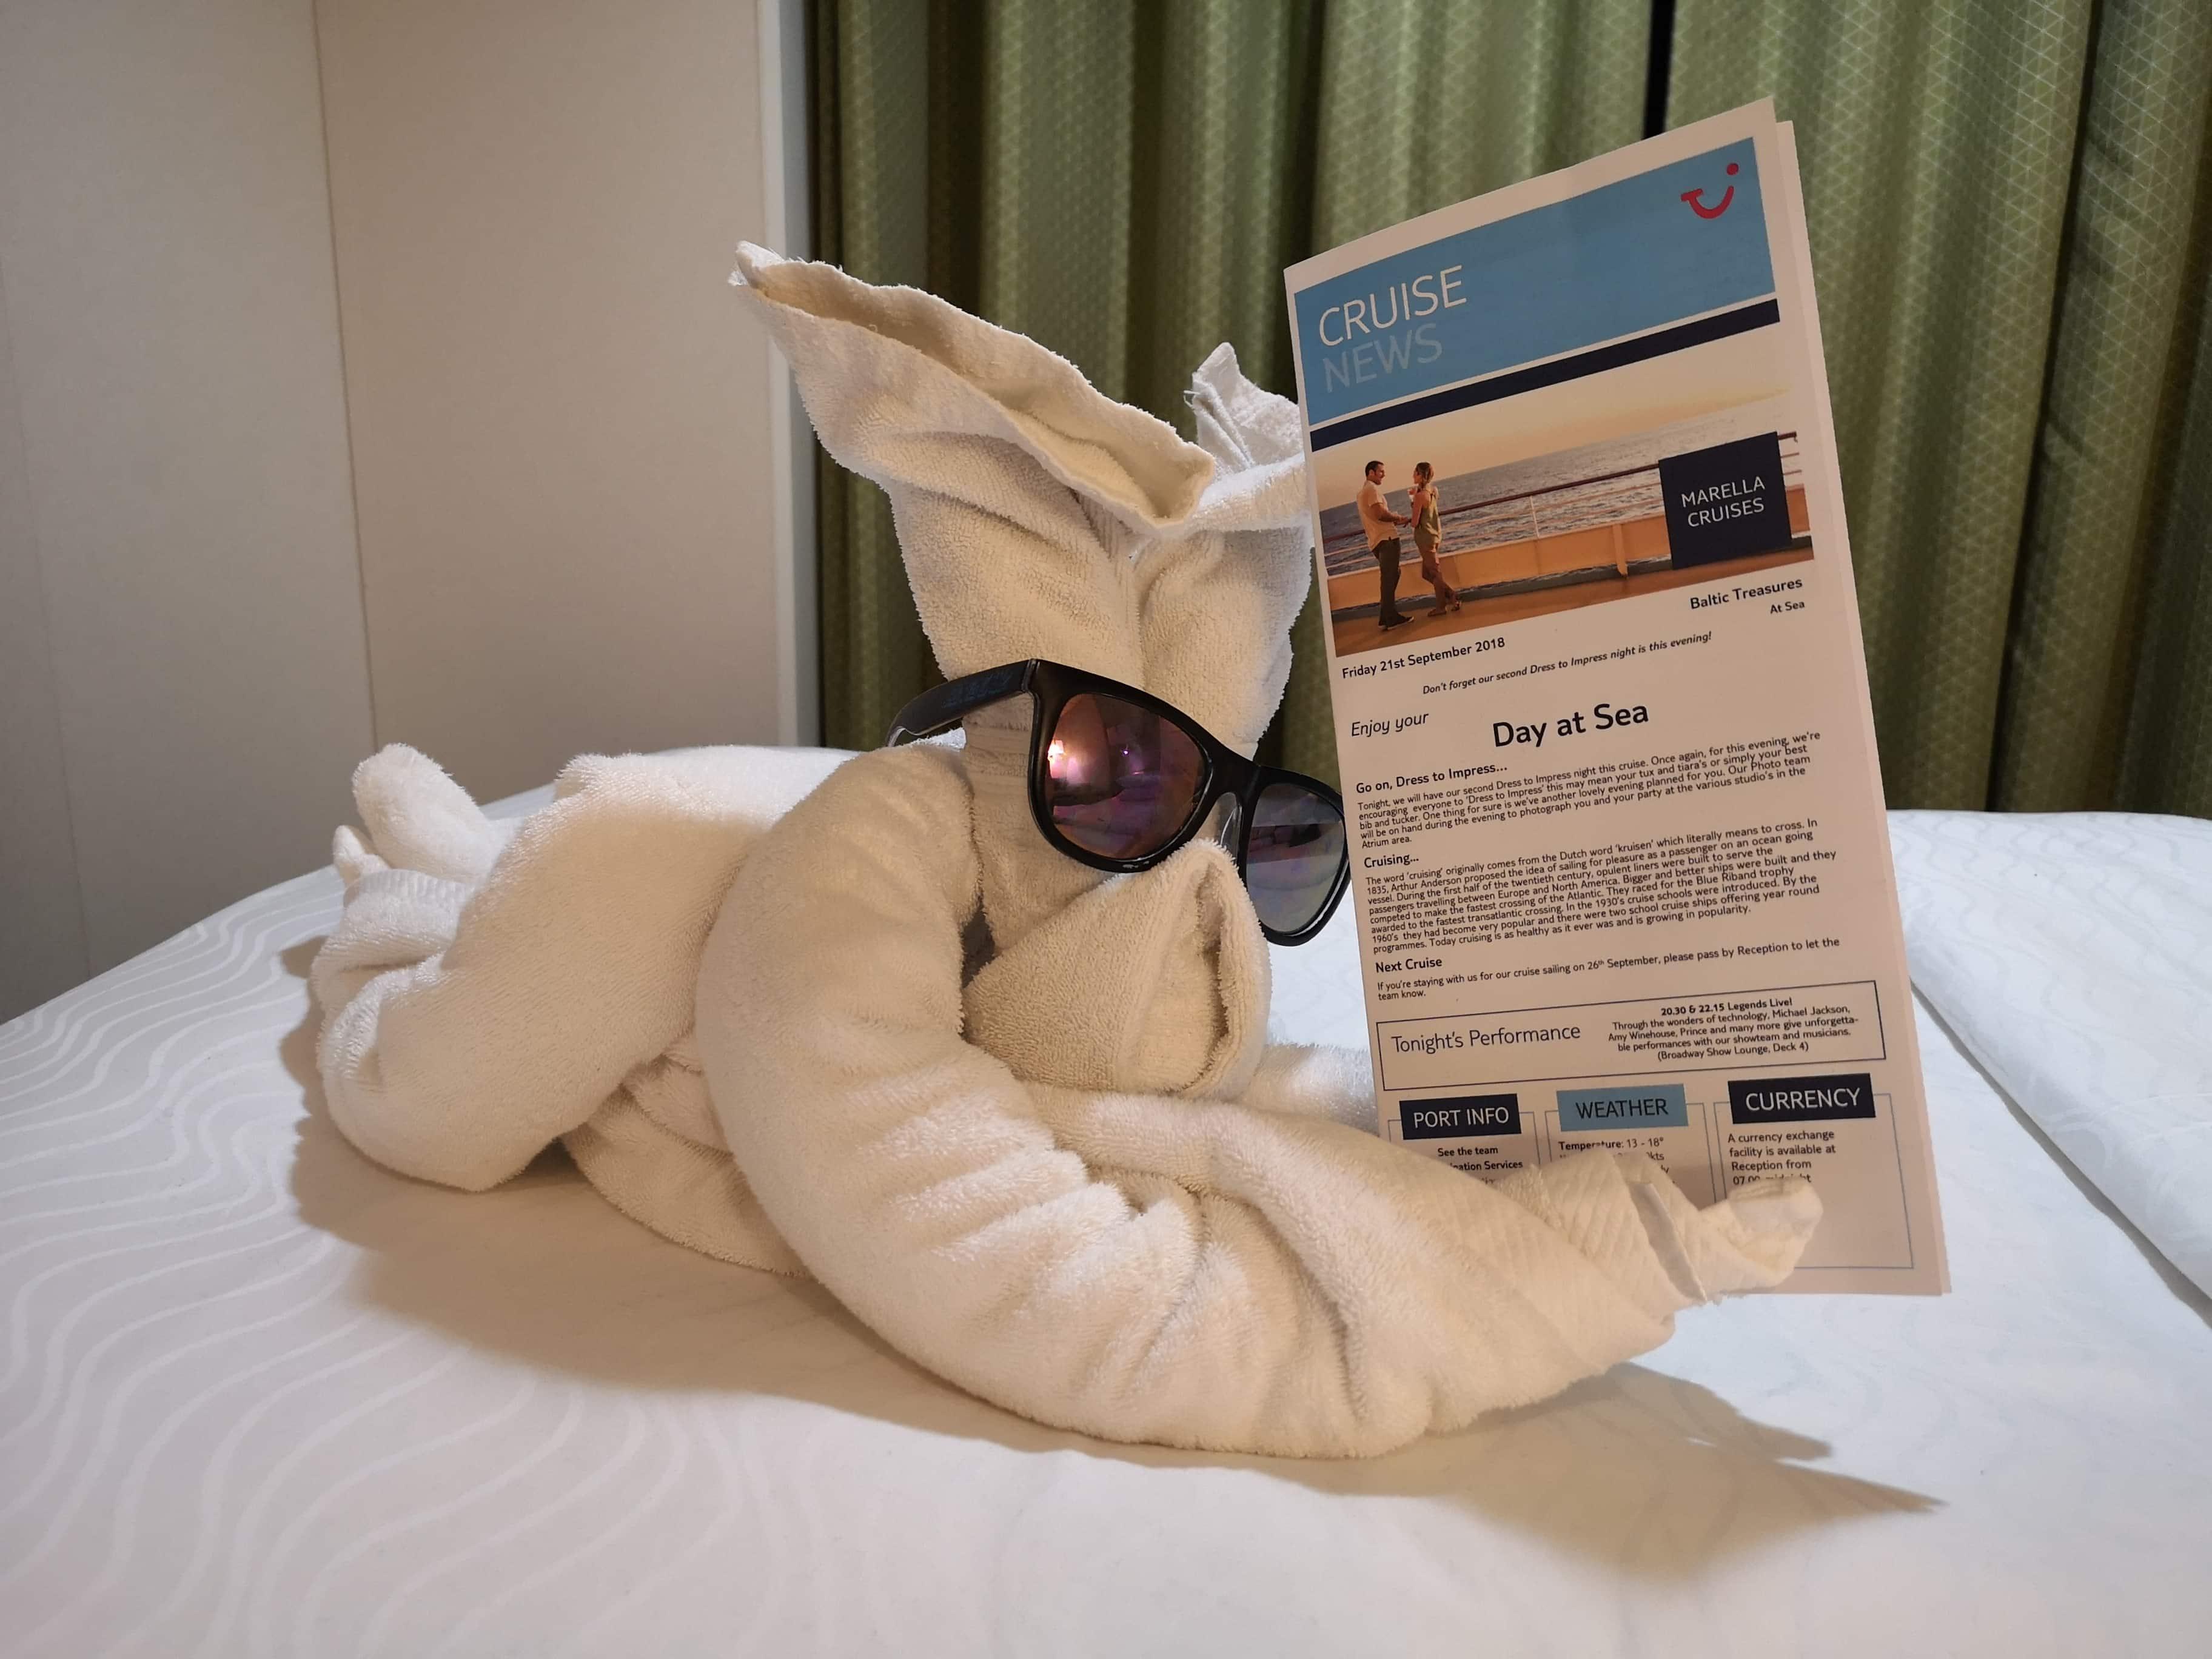 Marella Discovery Cruise News Towel Animal in Sunglasses